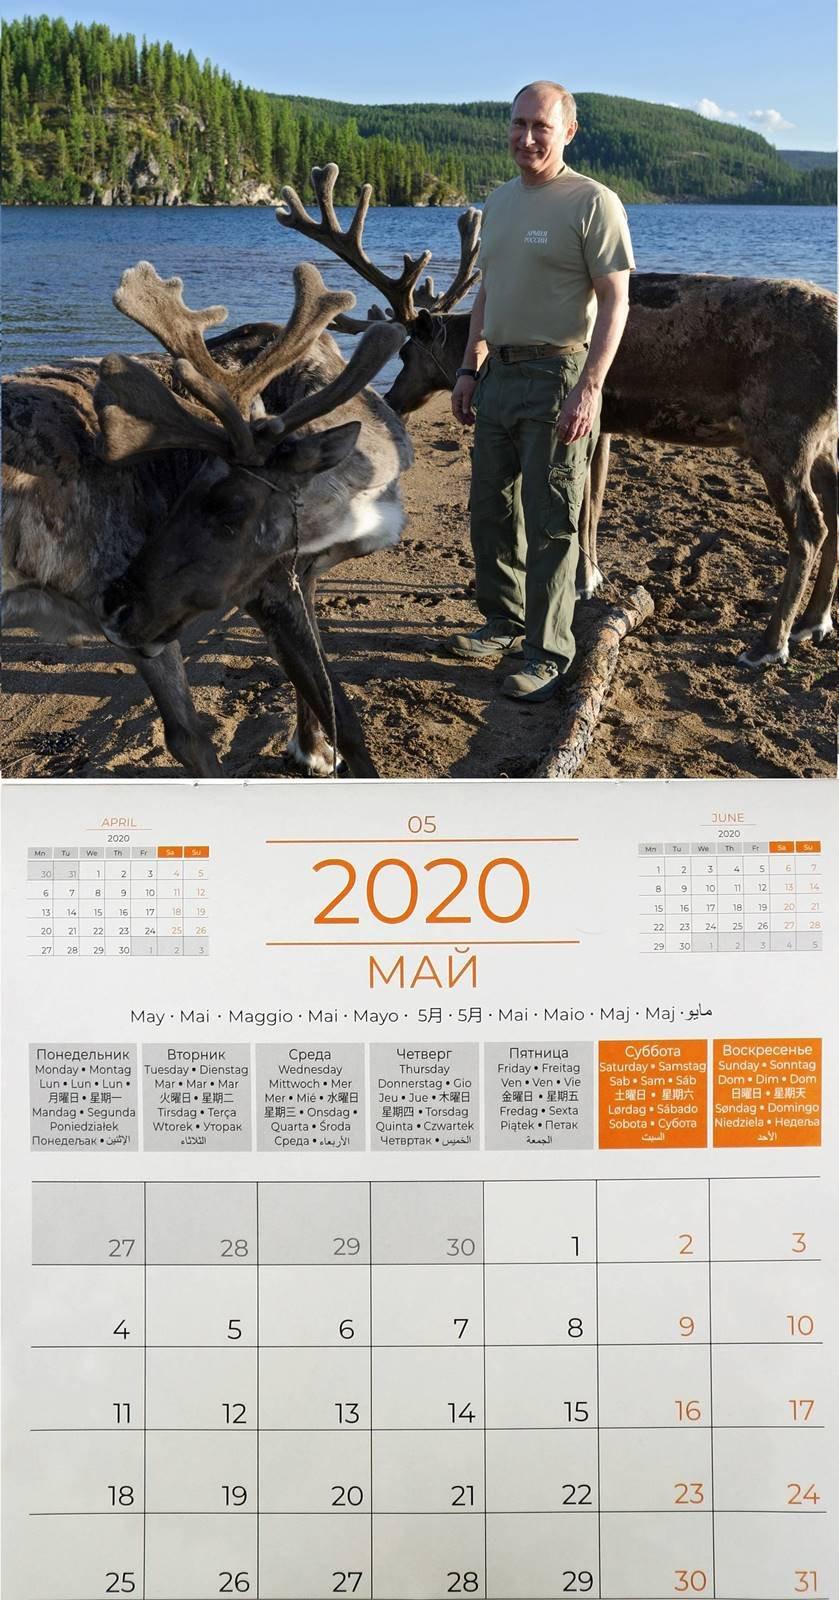 2021 Deer Rut Calaender | Calendar Printables Free Blank-Florida 2021 Deer Rut Prediction